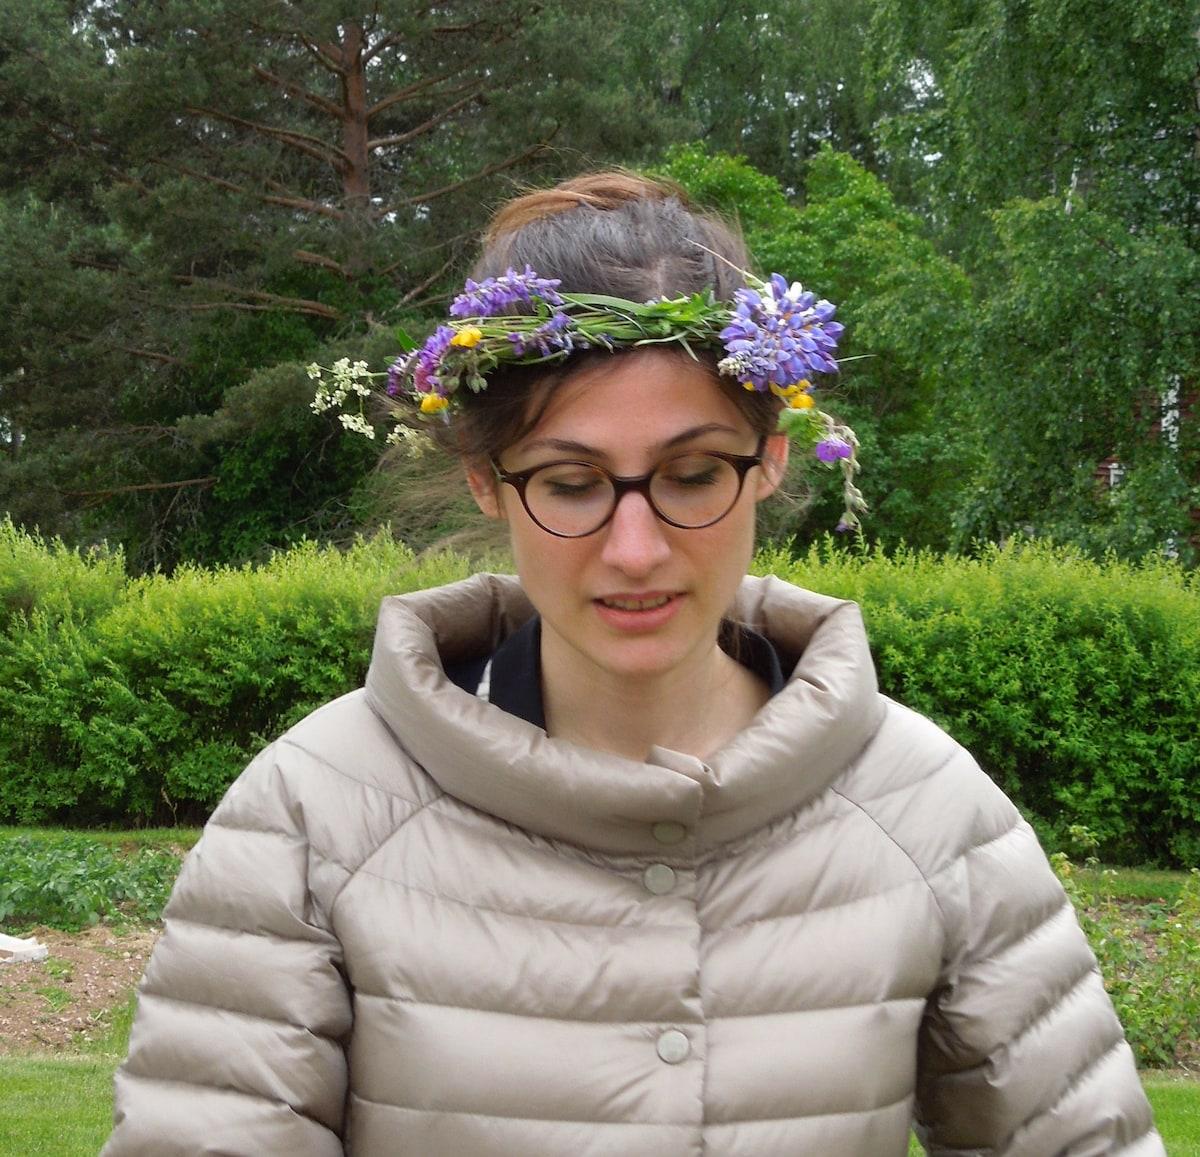 Daria from Leuven